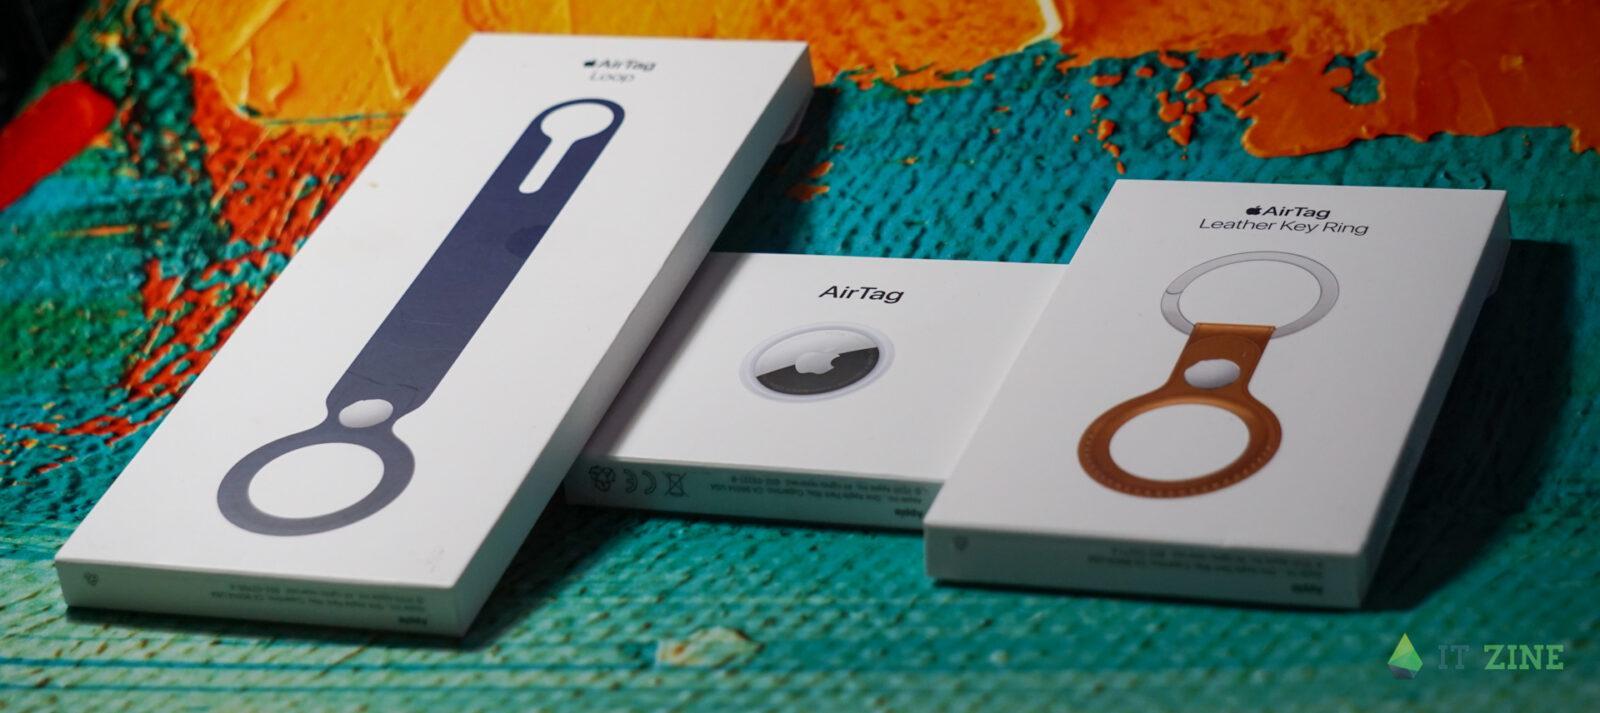 Упаковки Apple AirTag и аксессуаров